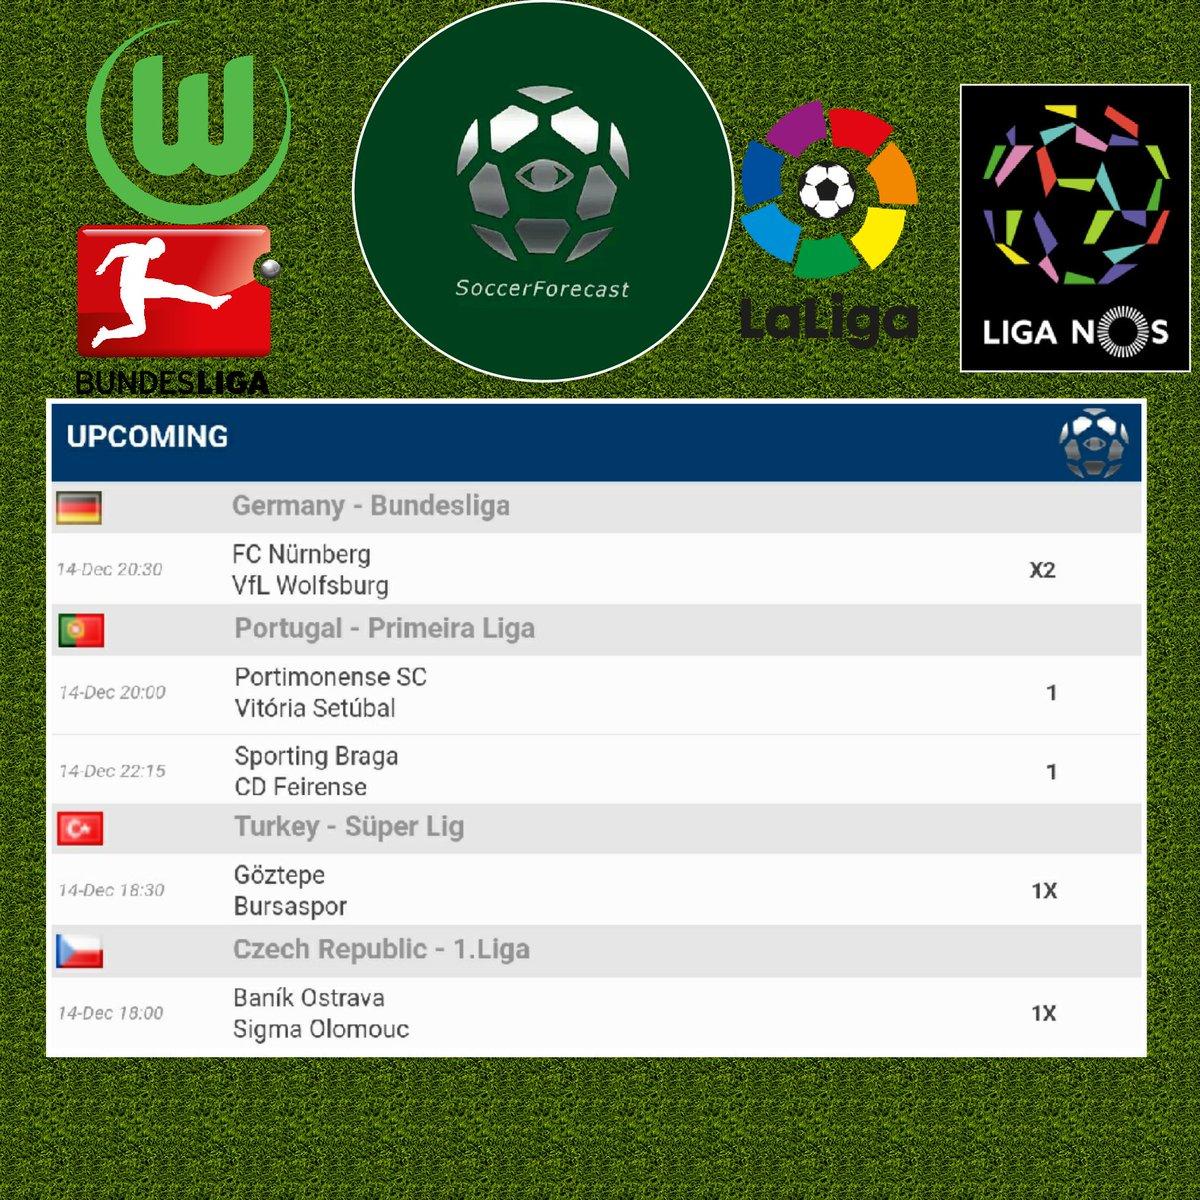 Today's correct forecasts! Subscribe to us on http://www.patreon.com/soccerforecast for exclusive forecasts! #soccer #football #足球 #Apple #Android #iOS #calcio #Patreon #Bundesliga #LigaNOS #Portimonense #braga #Goeztepe #Bursaspor #Czech